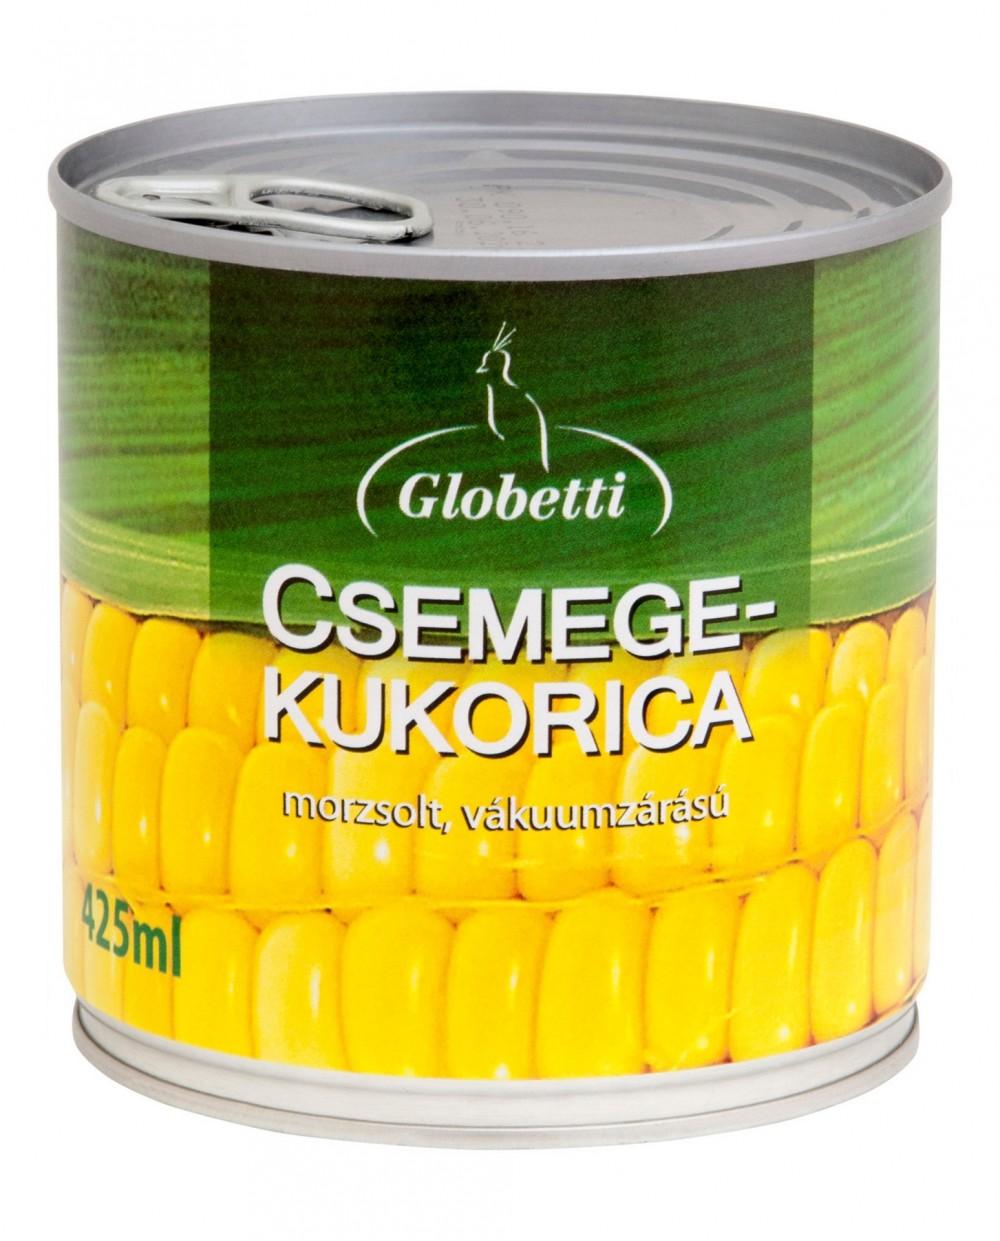 MORZSOLT CSEMEGE KUKORICA GLOBETTI 340G